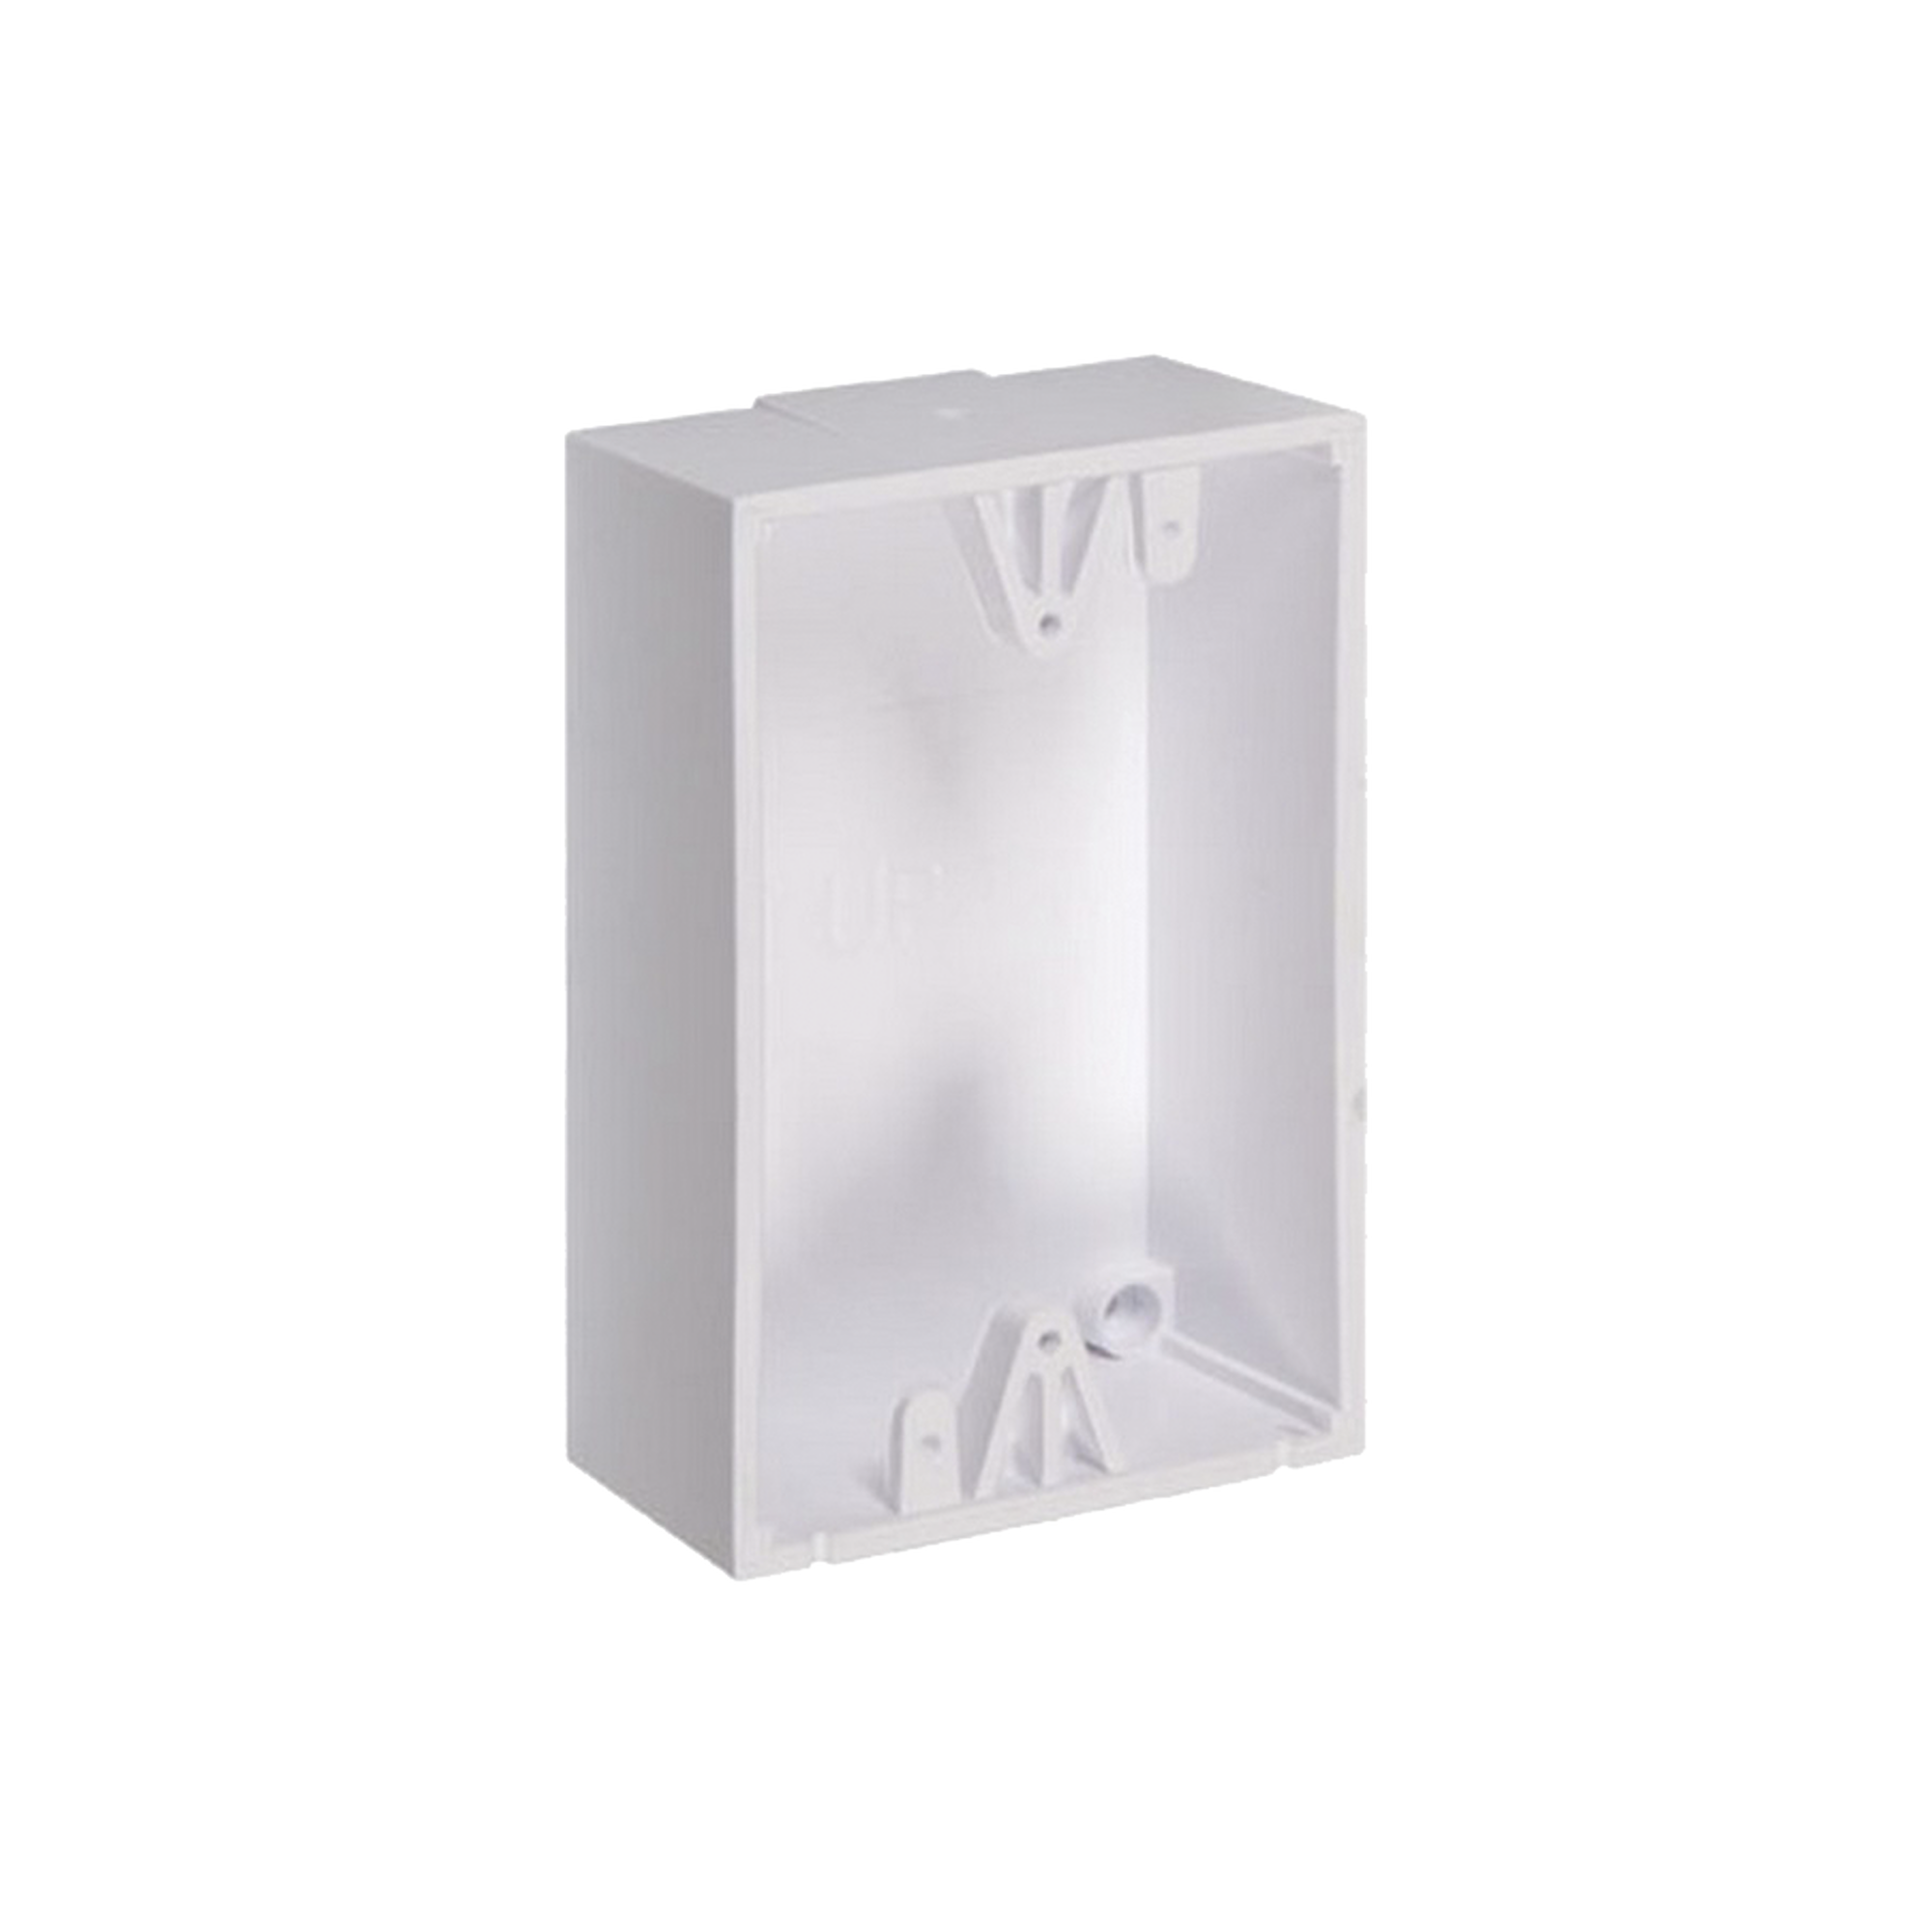 Caja de Montaje Color Blanco para Botones de Emergencia STI